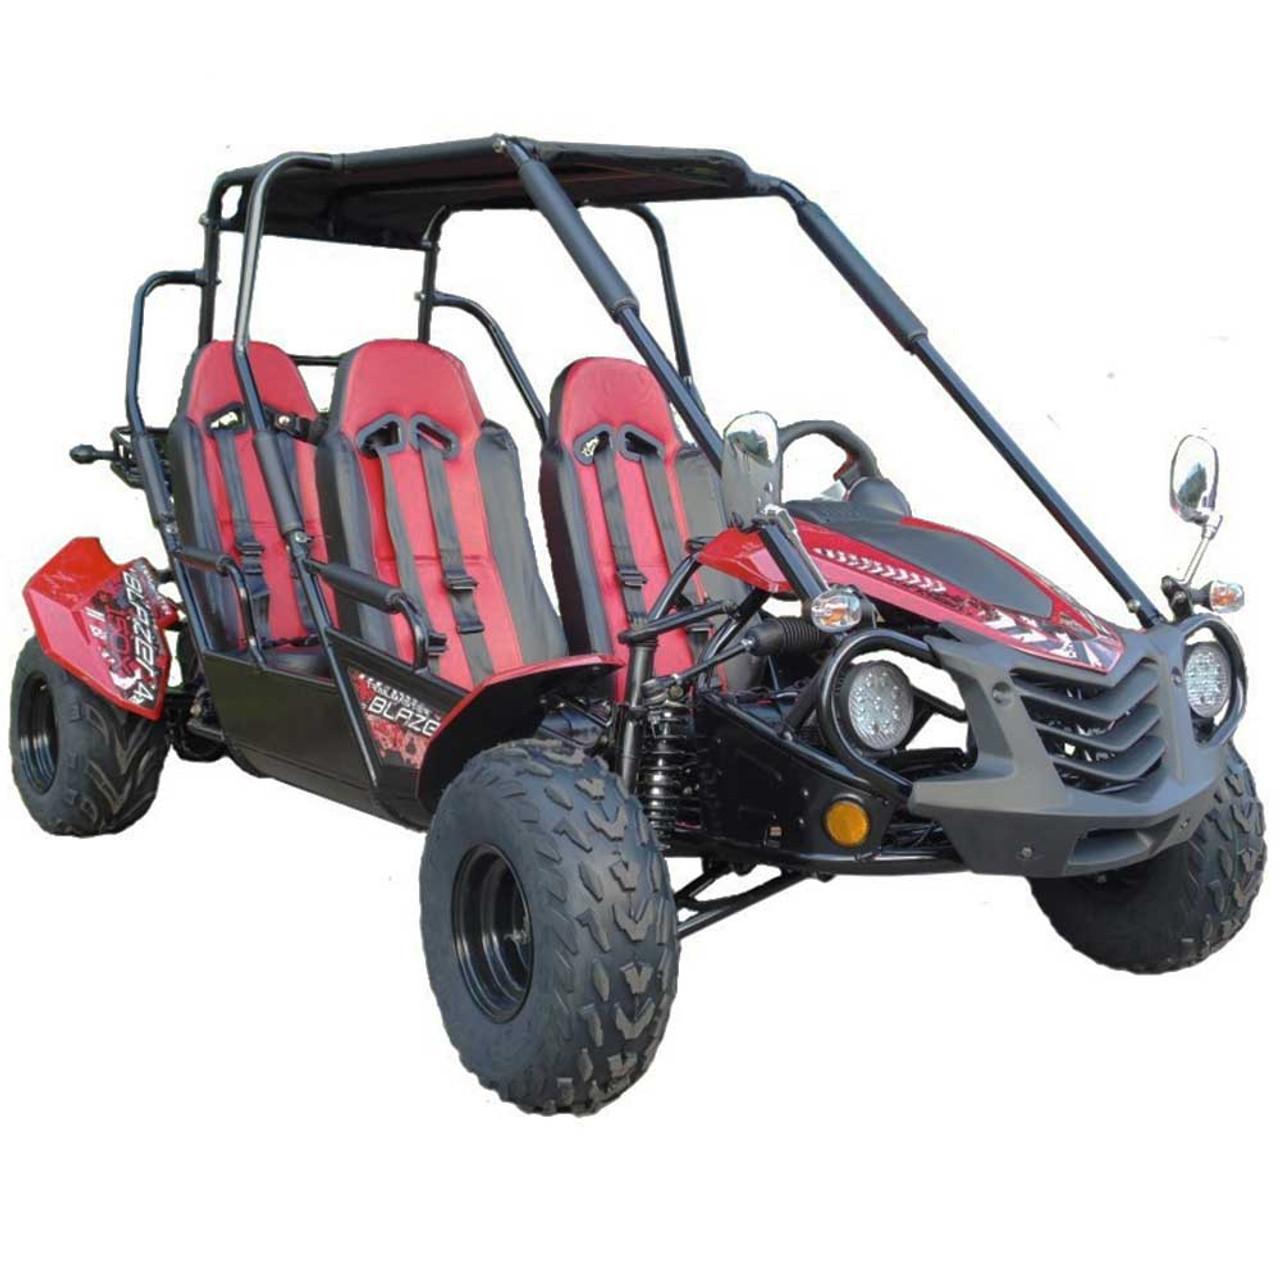 TrailMaster Blazer4 150X Go Kart - Red